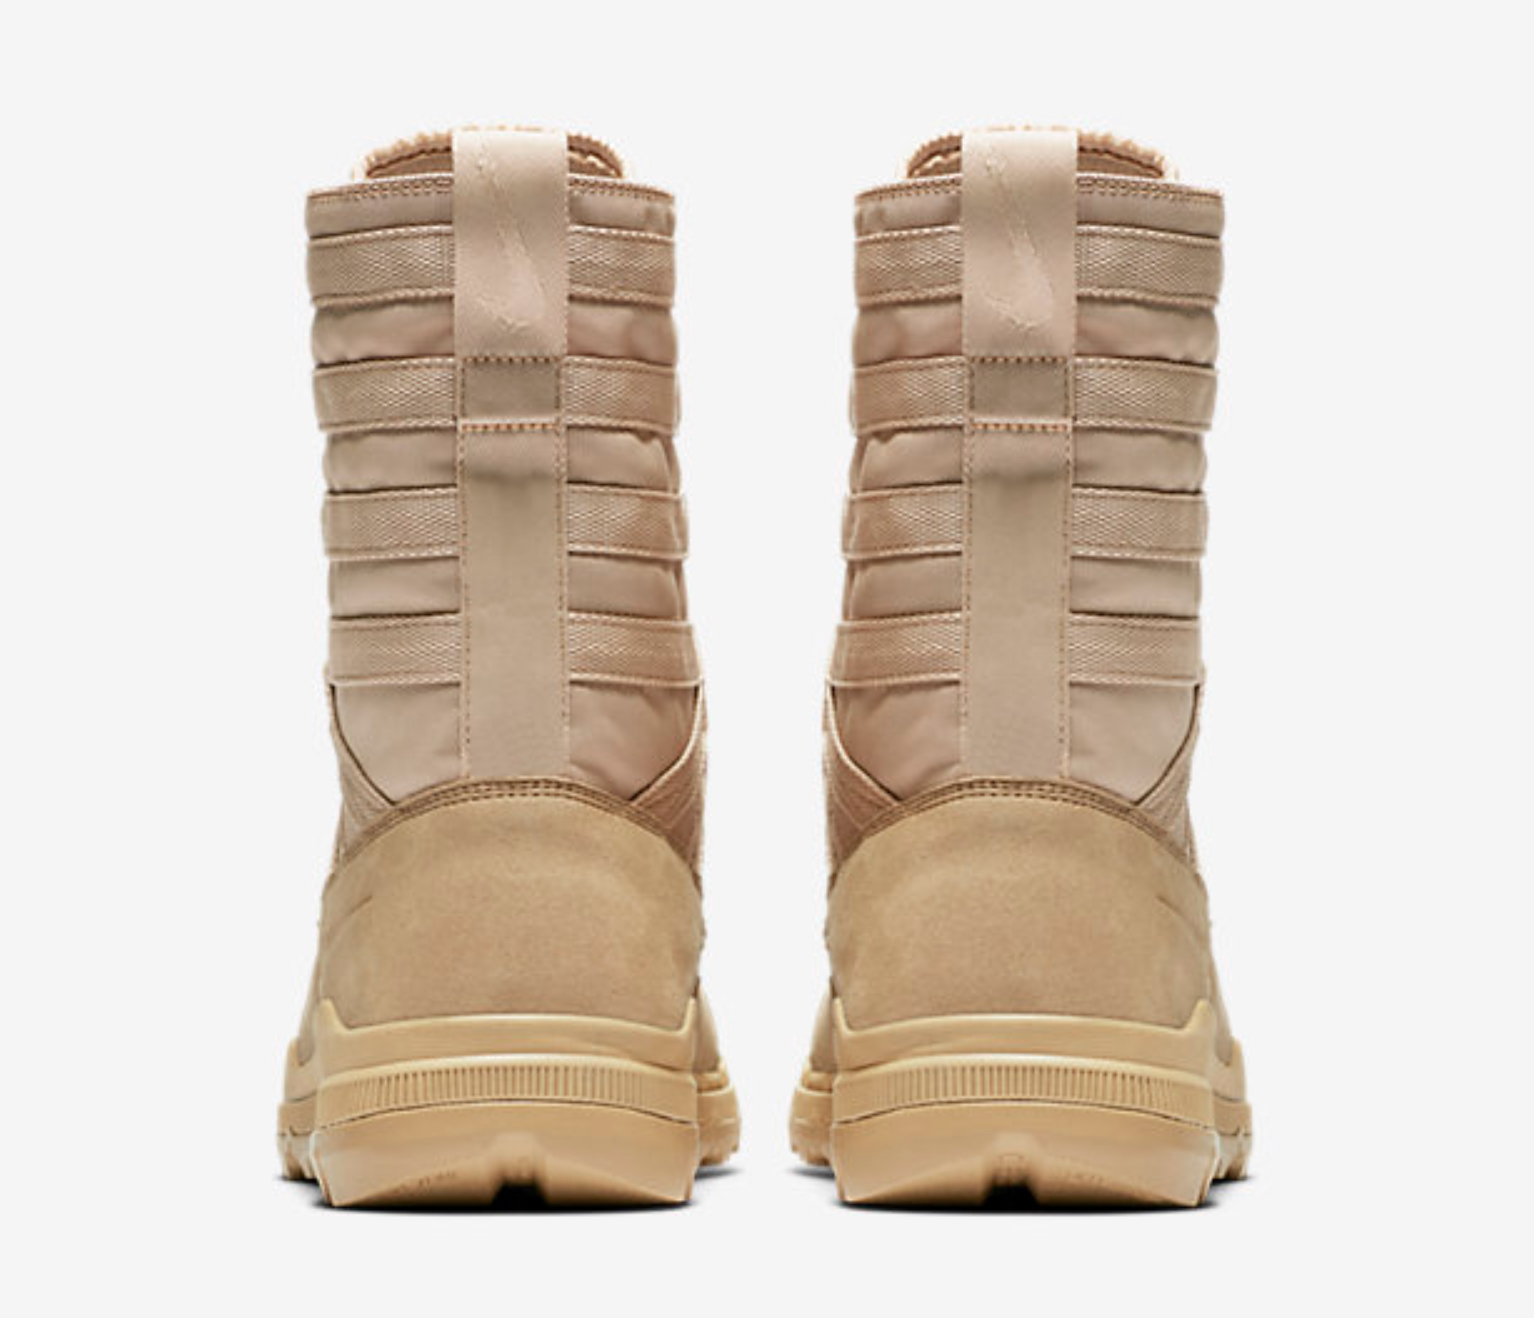 reputable site c1f35 66cd4 Nike SFB Gen 2 8″ Boot 8